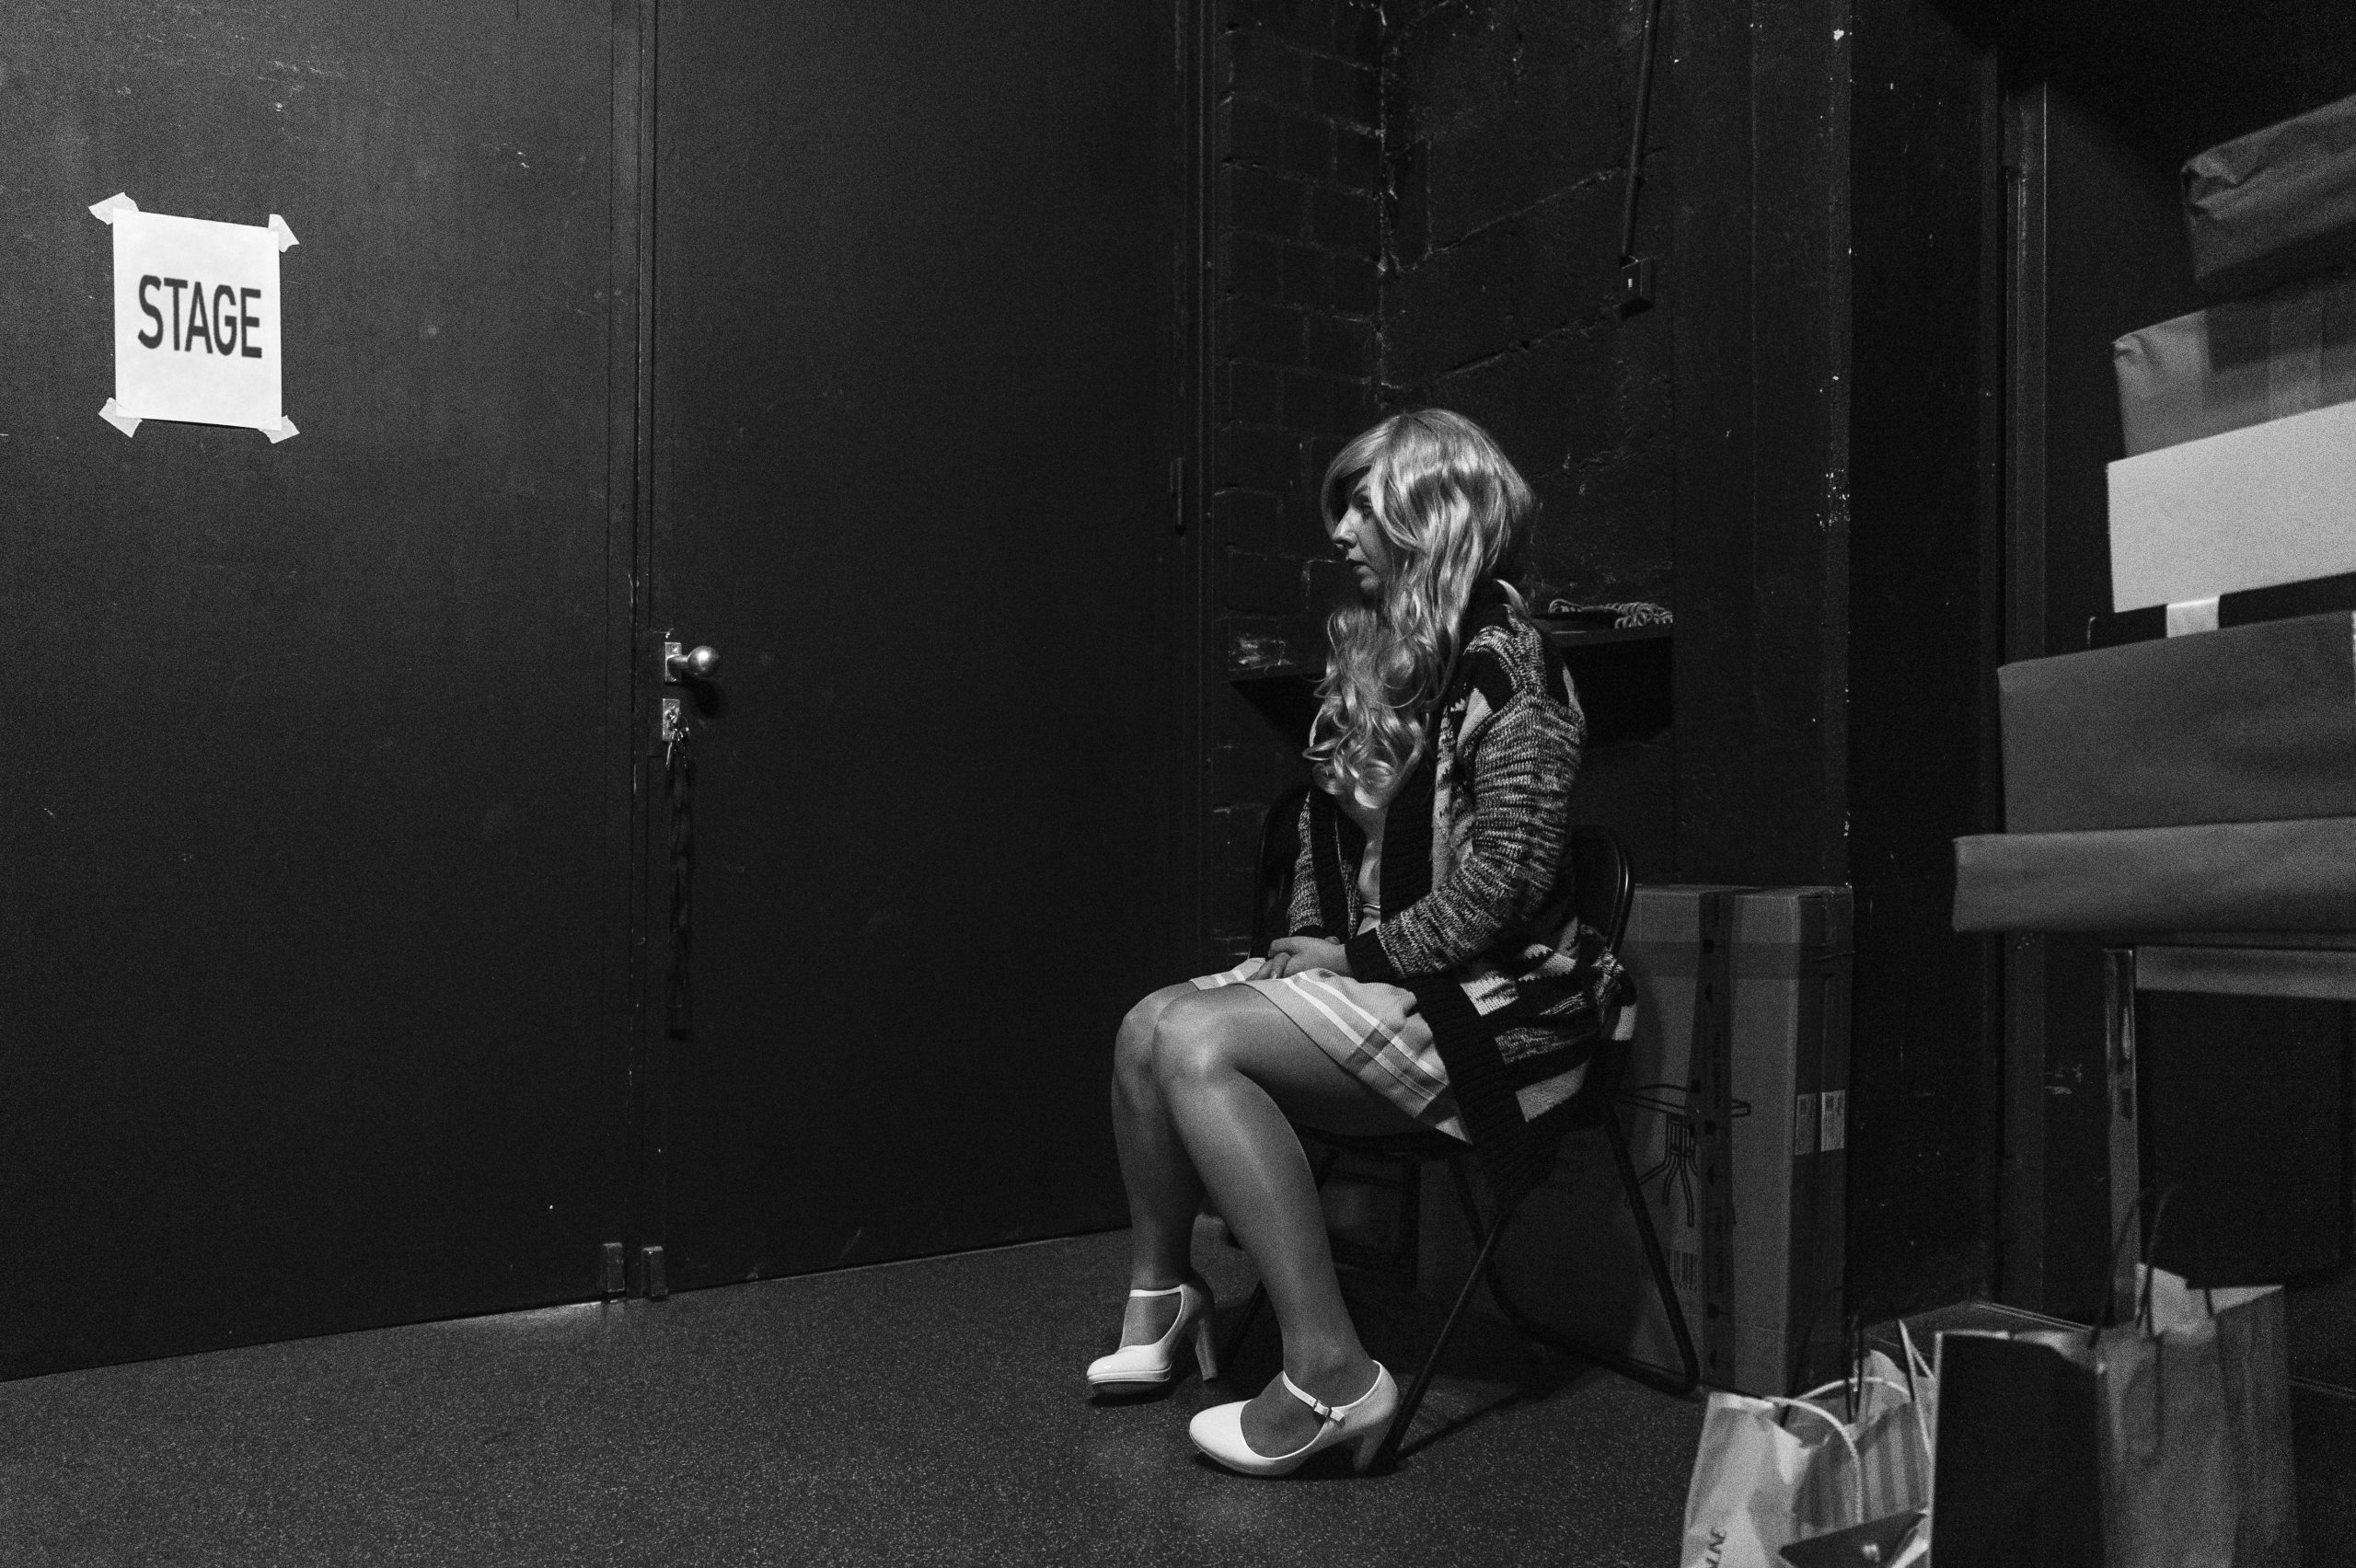 Cynthia Ruf Photography Fotografie Theater Schauspieler Drama